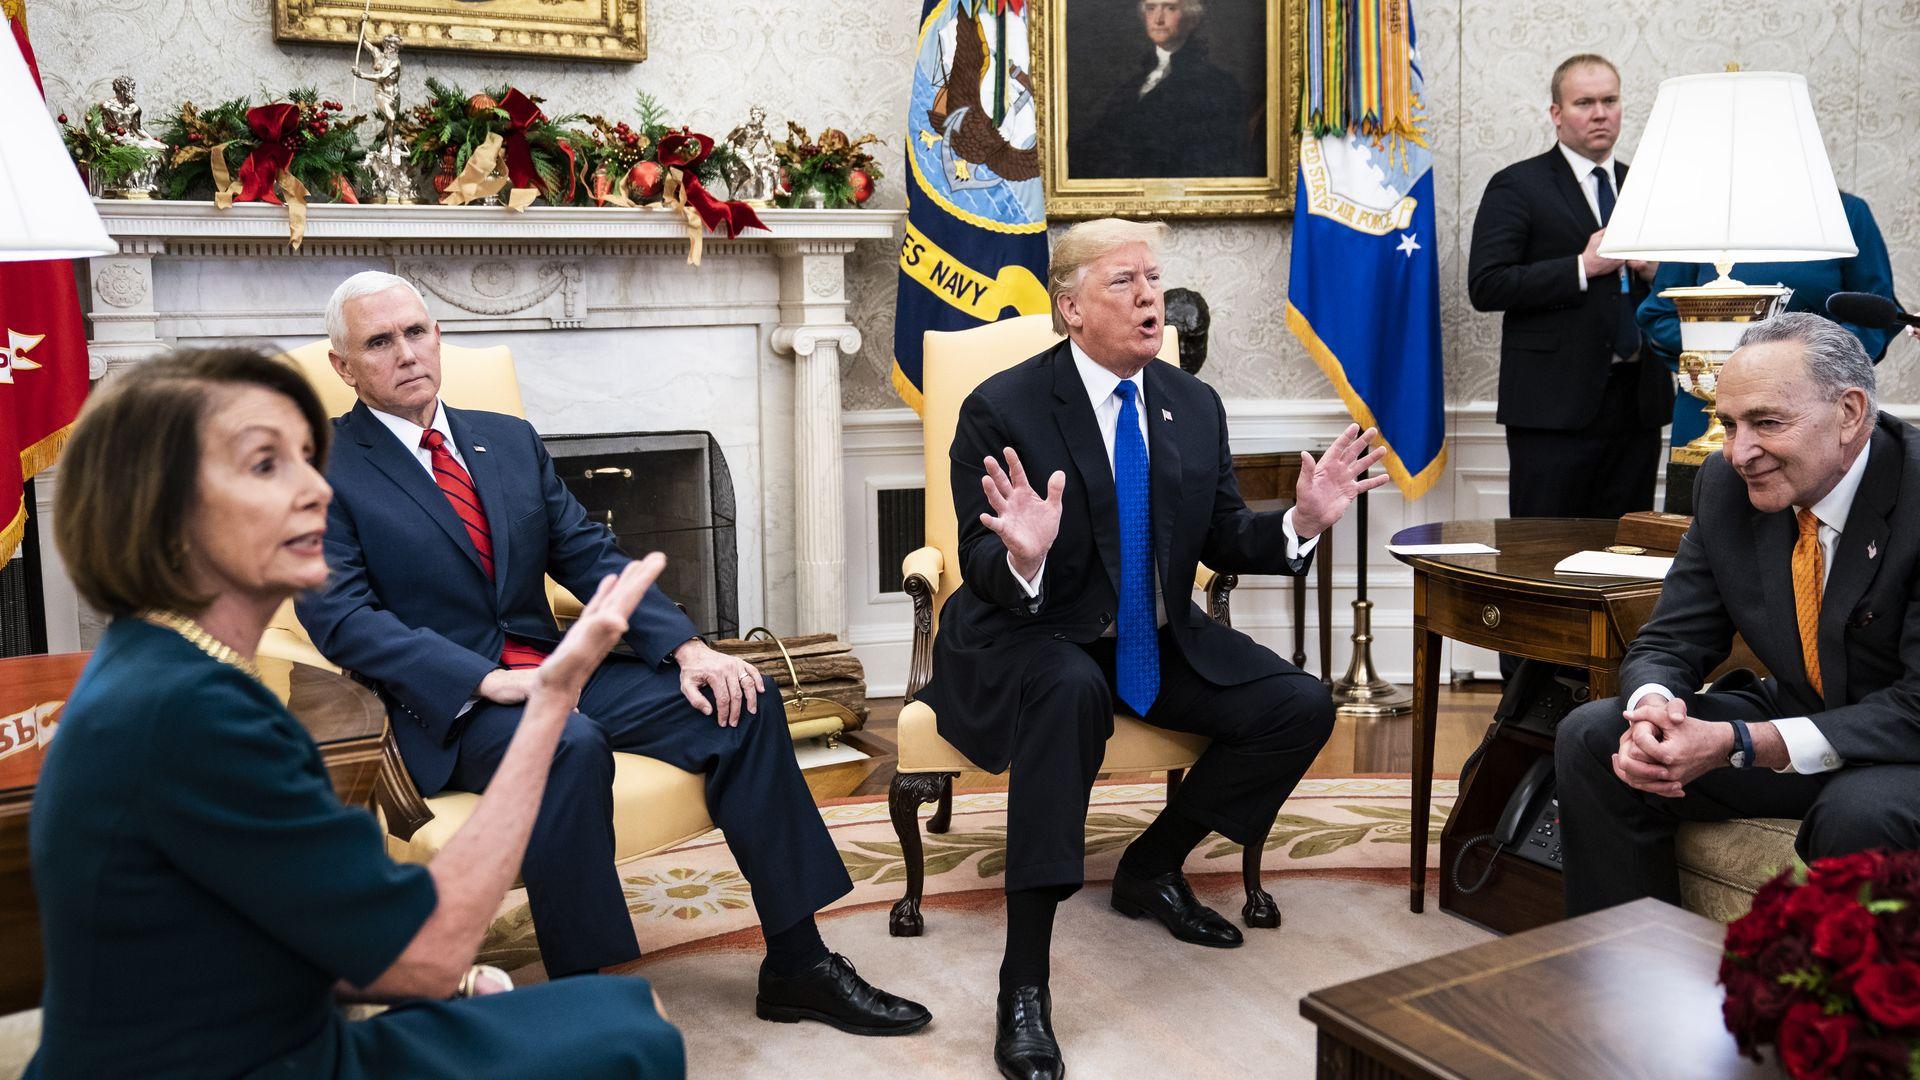 Pelosi, Pence, Trump and Schumer